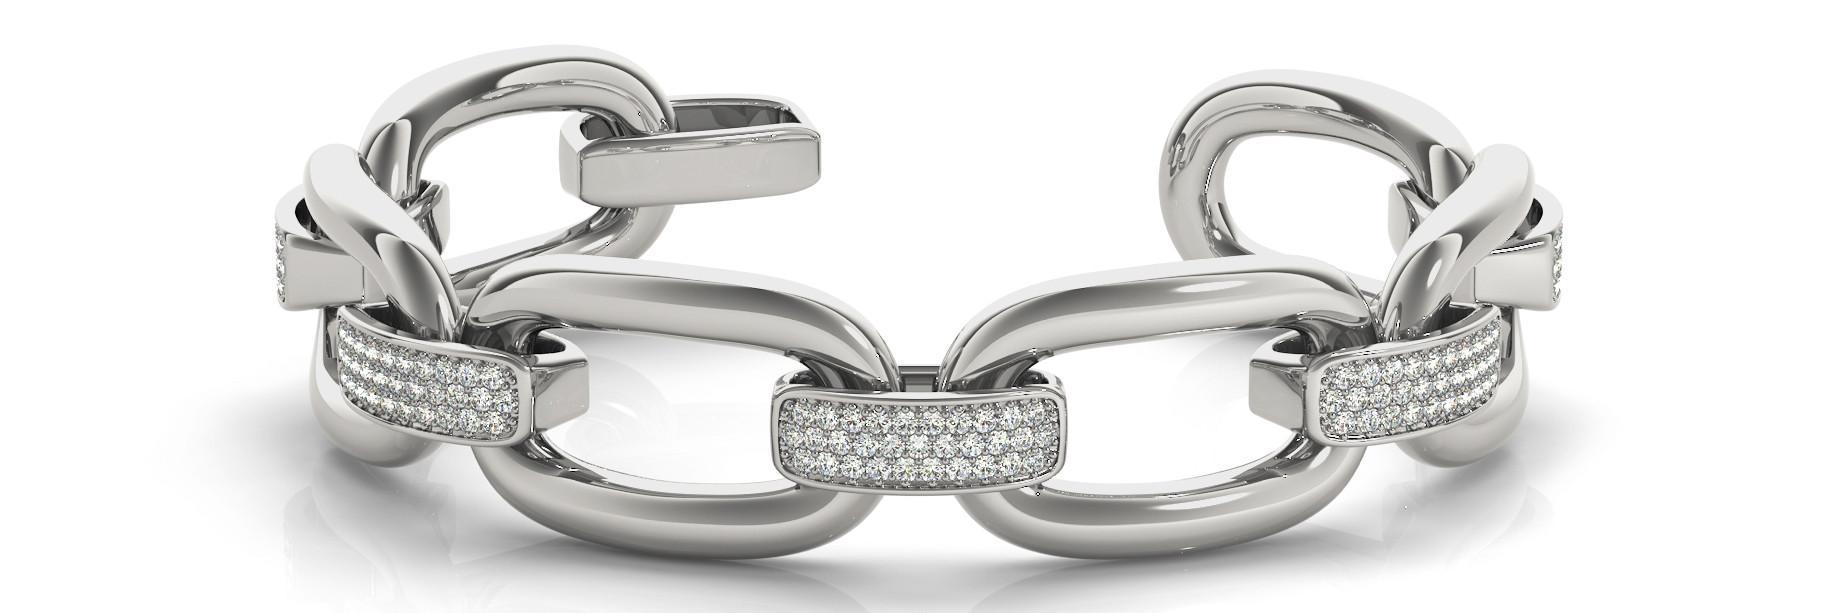 Bracelet Italian Made <p></p><p>Length - 8 Inch</p><p>Width - .70 Inch</p>